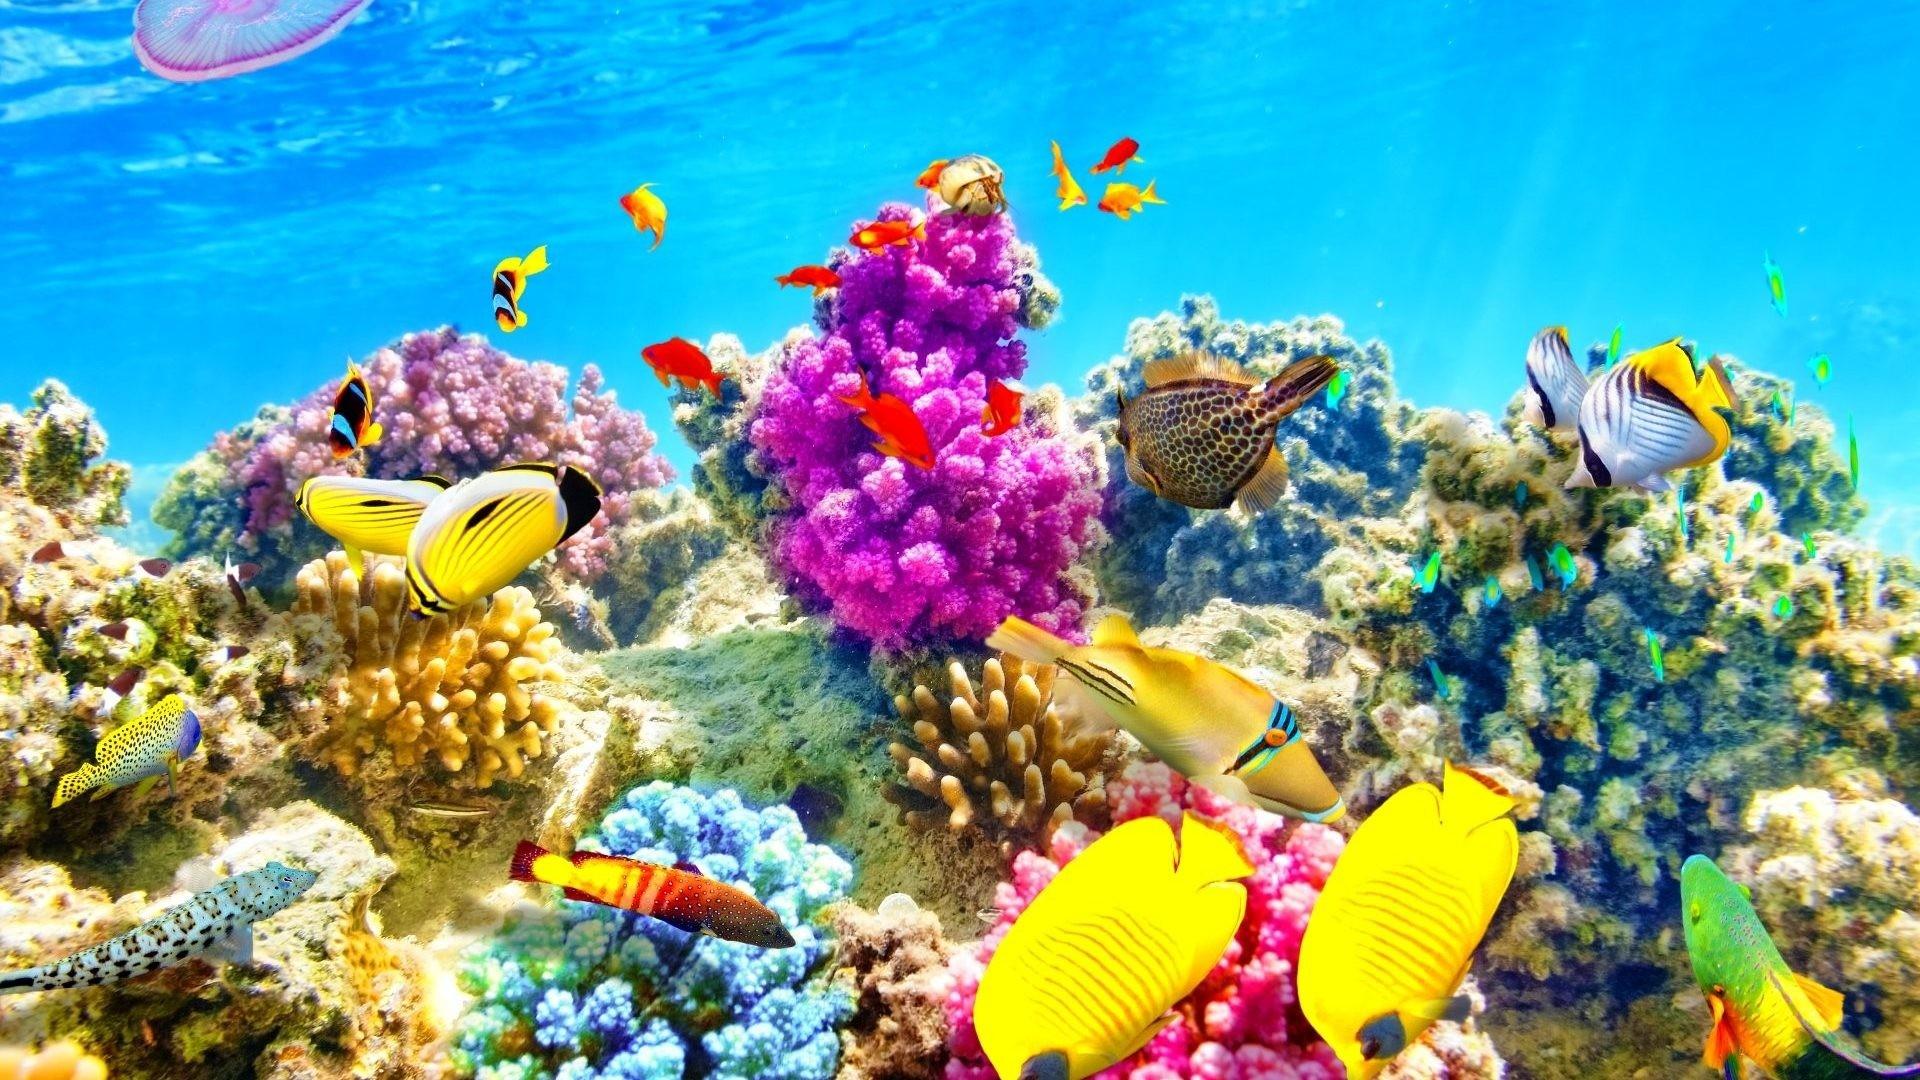 Res: 1920x1080, Fishes Sealife Nature Fish Ocean Sea Underwater Image Clown